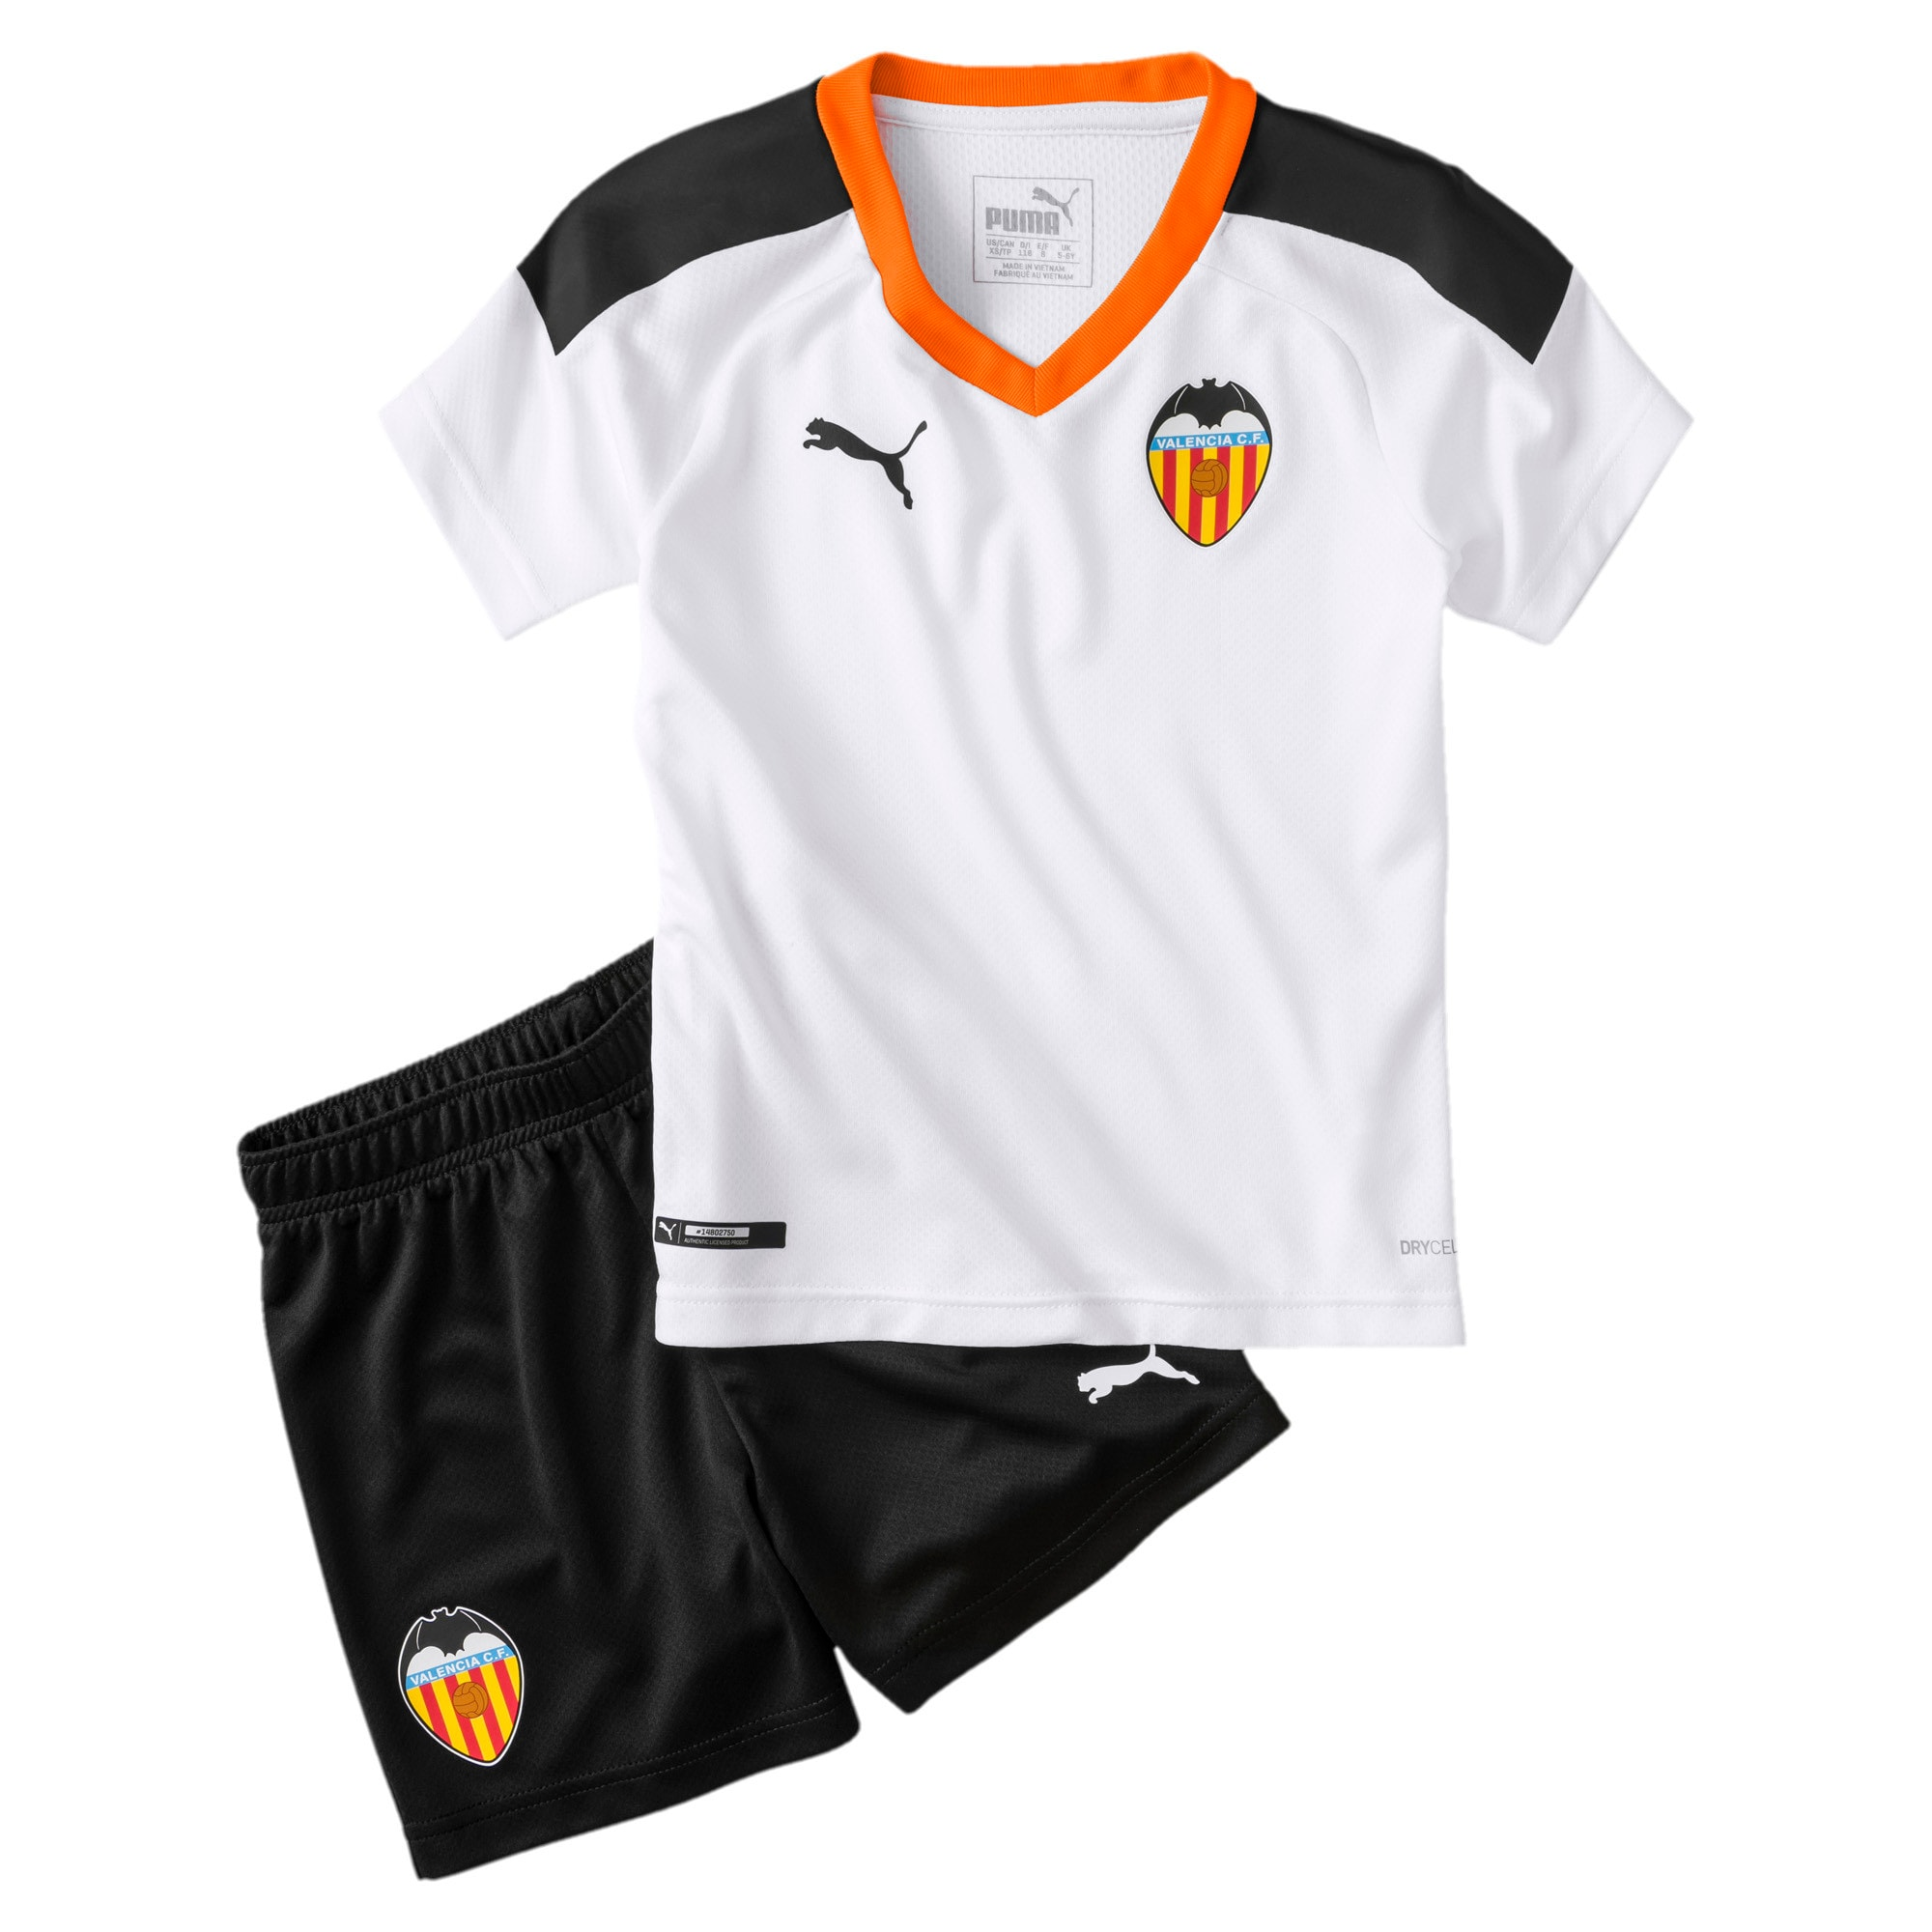 Imagen en miniatura 1 de Minikit de la primera equipación de niño Valencia CF, White- Black-Vibrant Orange, mediana